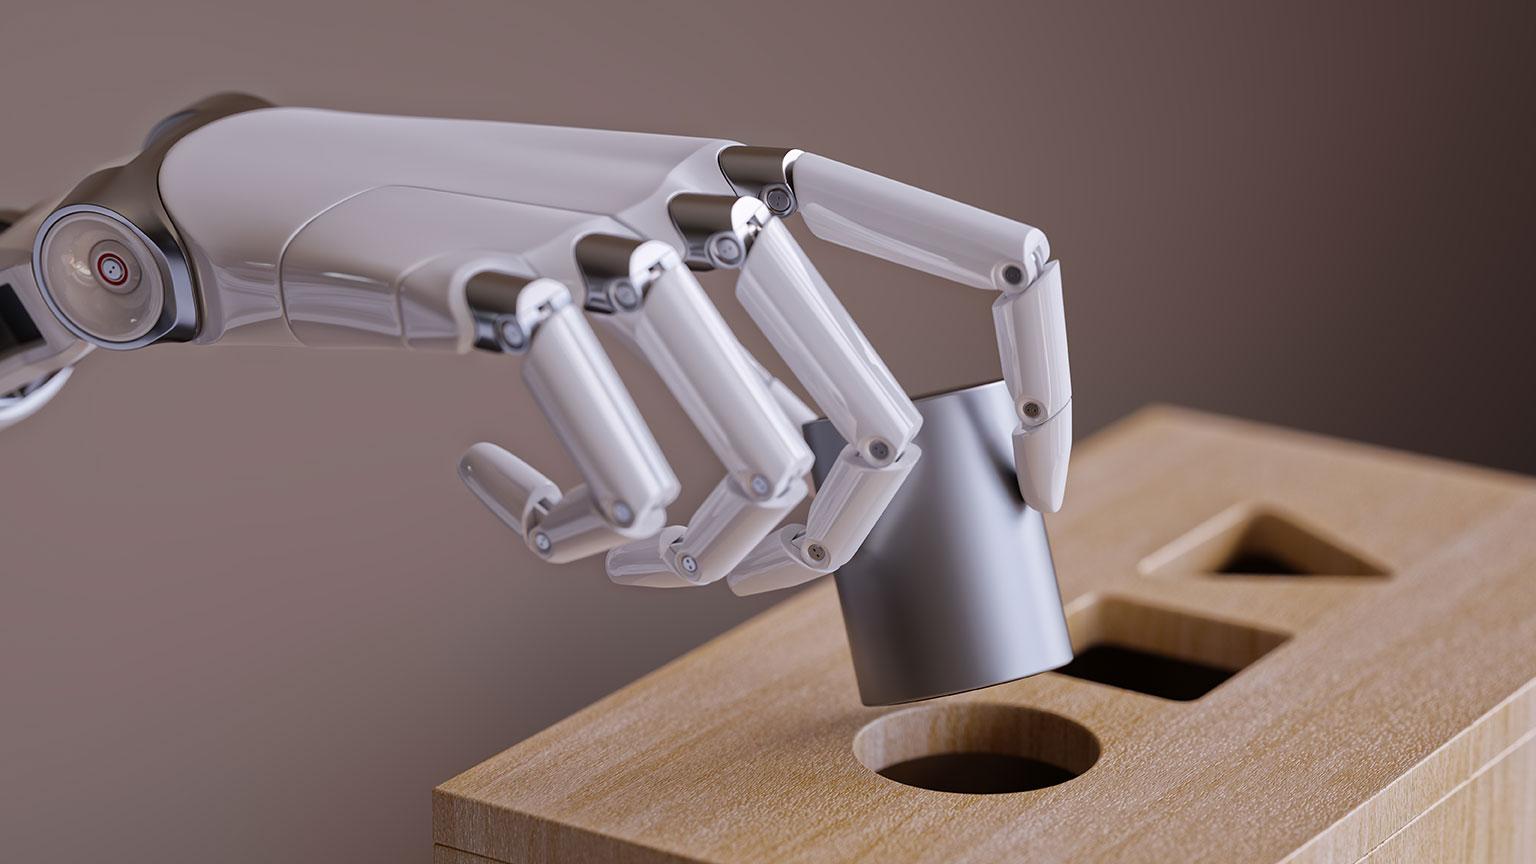 Robotic Machine Learning